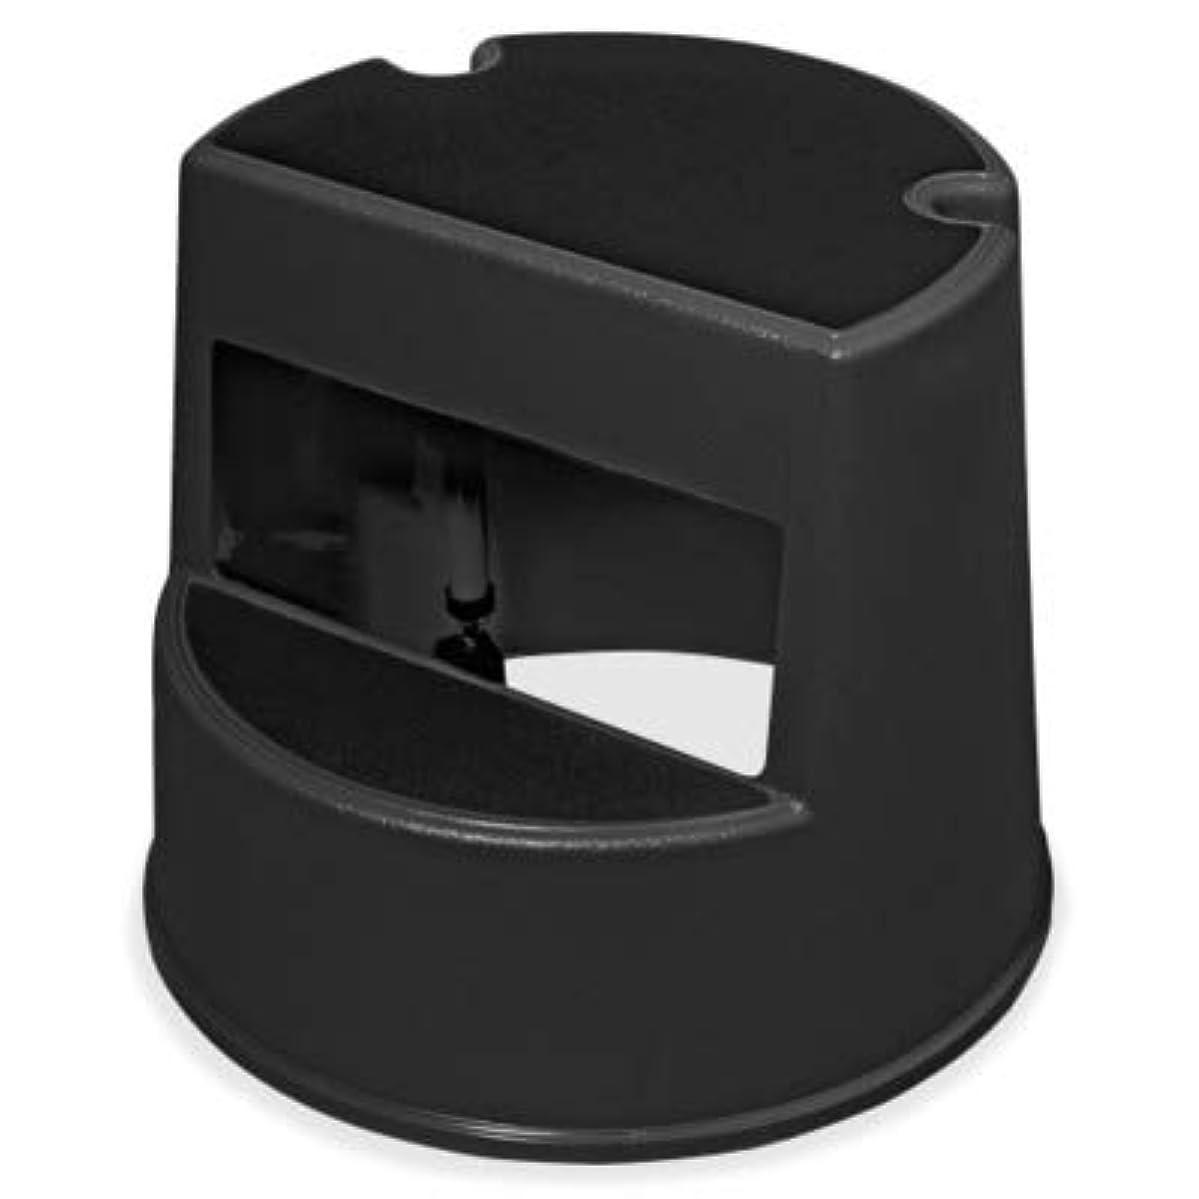 Rubbermaid Rolling Step Stool - 350 lb Load Capacity - 16quot; x 16quot; x 13quot; - Black